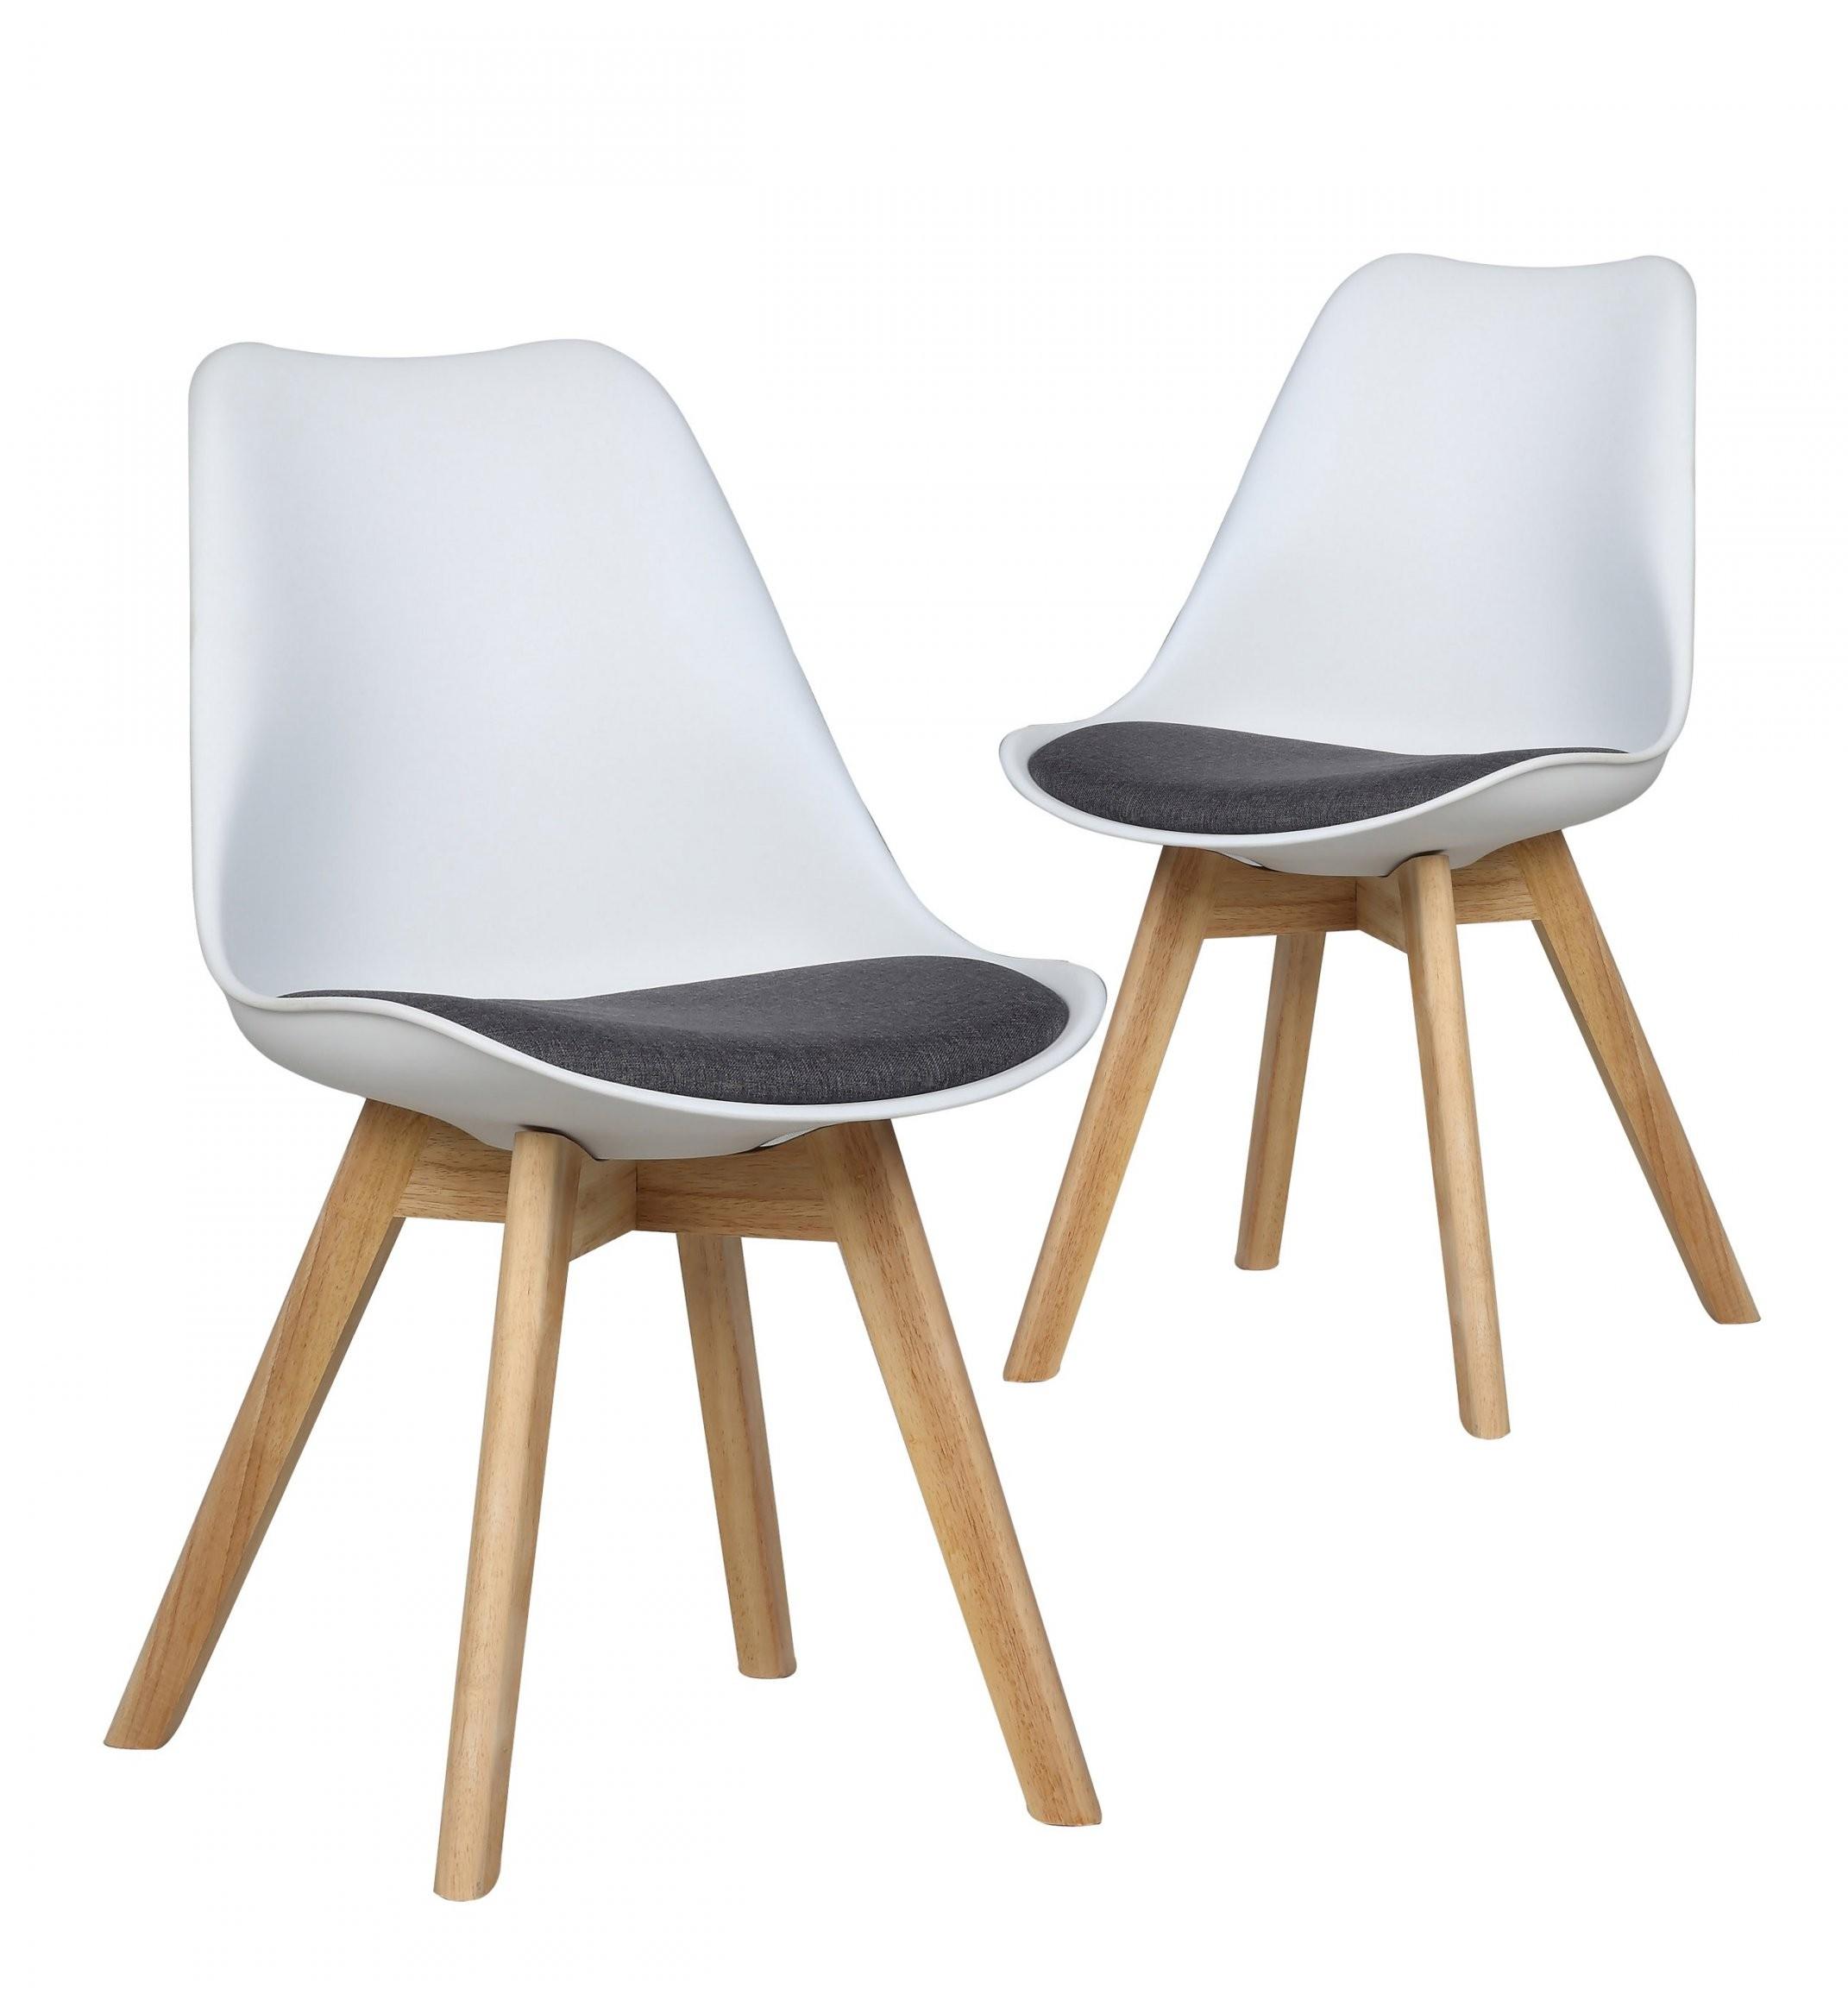 Stühle Malmö  Set (2 Stühle Skandinavisches Design Weißgrau Pu von Stühle Skandinavisches Design Photo